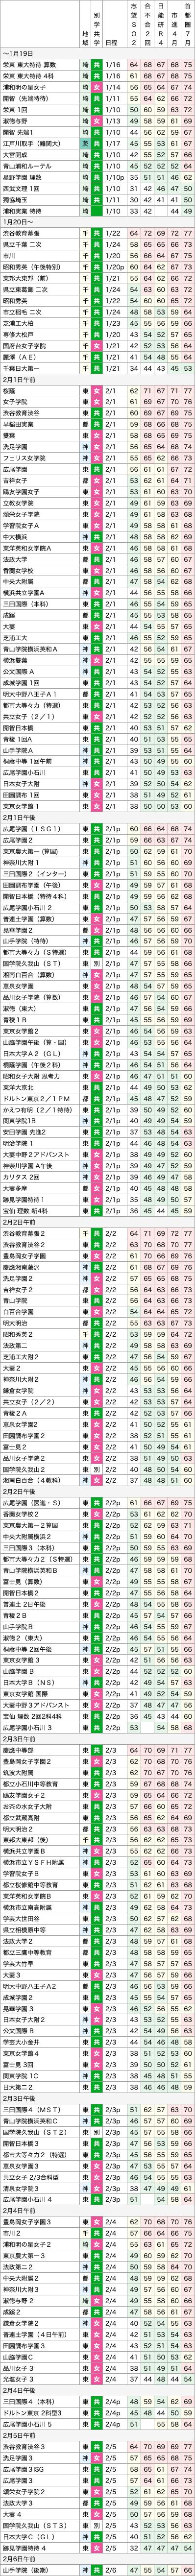 https://e-tutor.tokyo/data/20210826/02.png